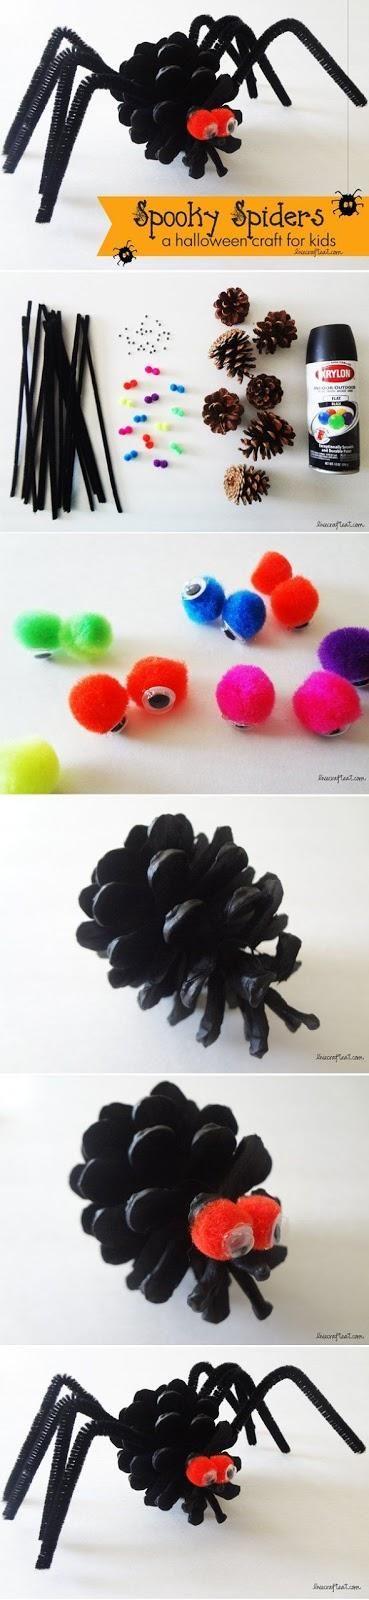 DIY Tutorial: DIY Halloween / DIY halloween spider craft for kids - Bead&Cord